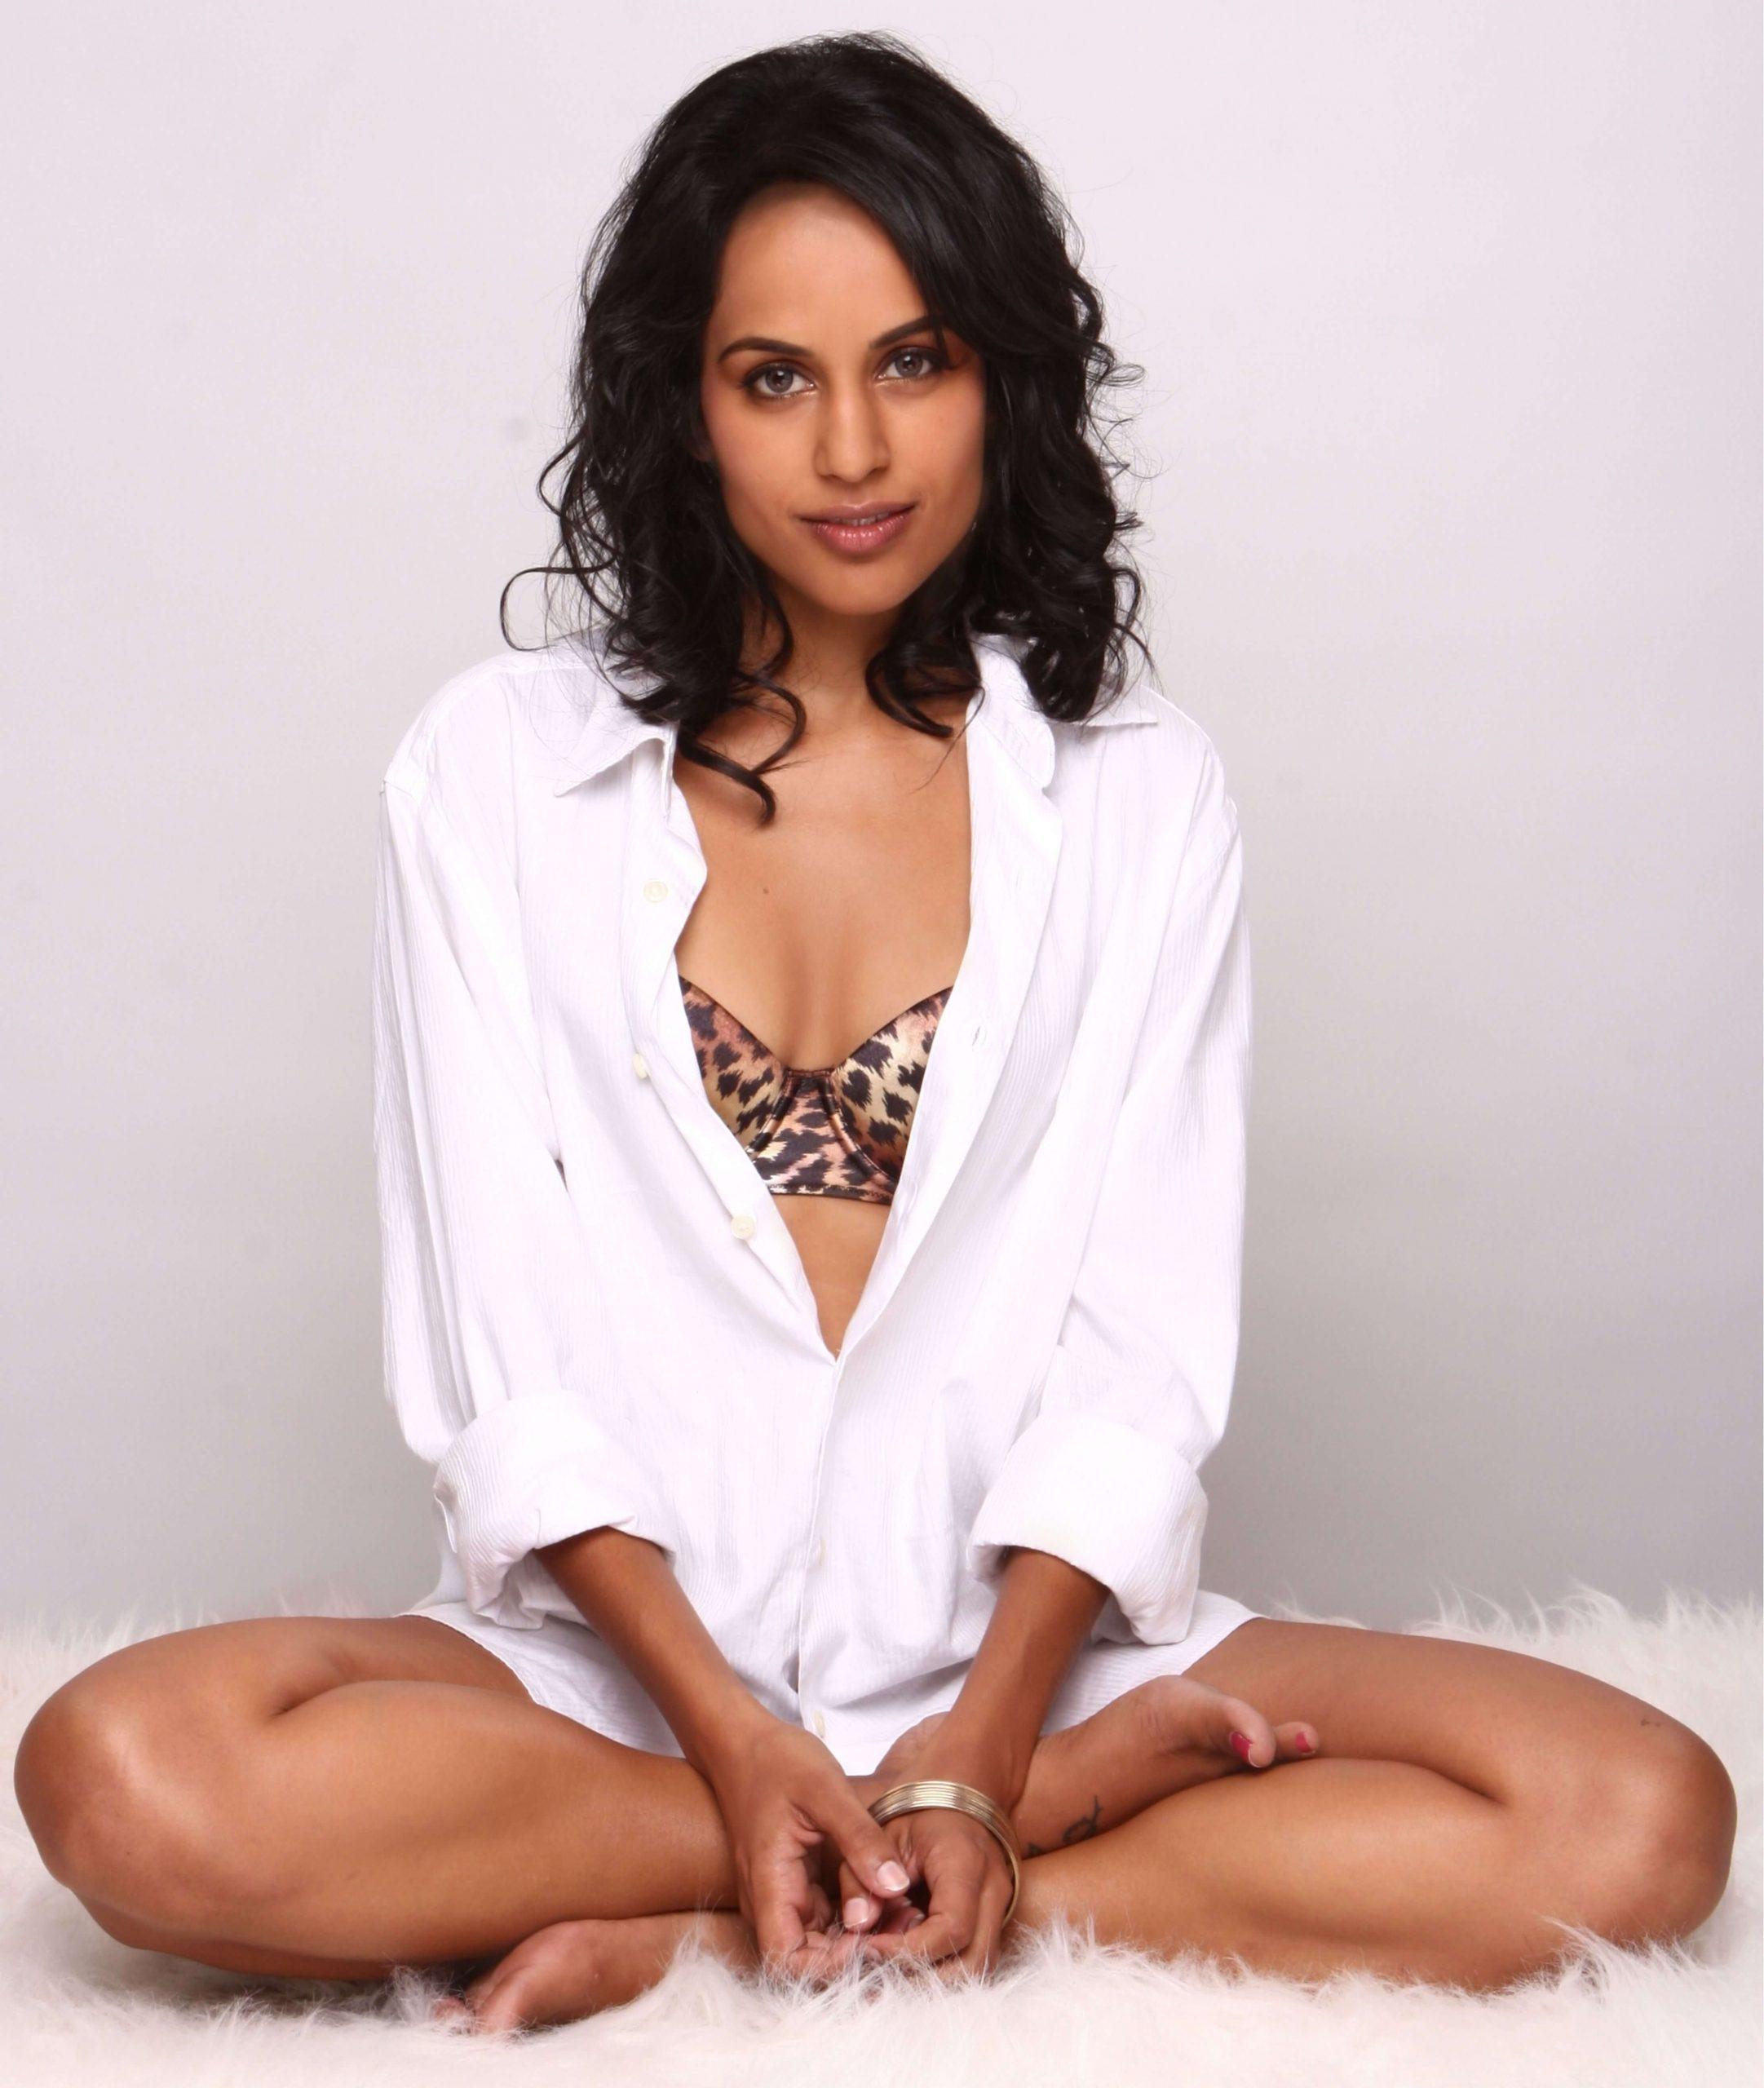 Agam Darshi hot cleavage pics